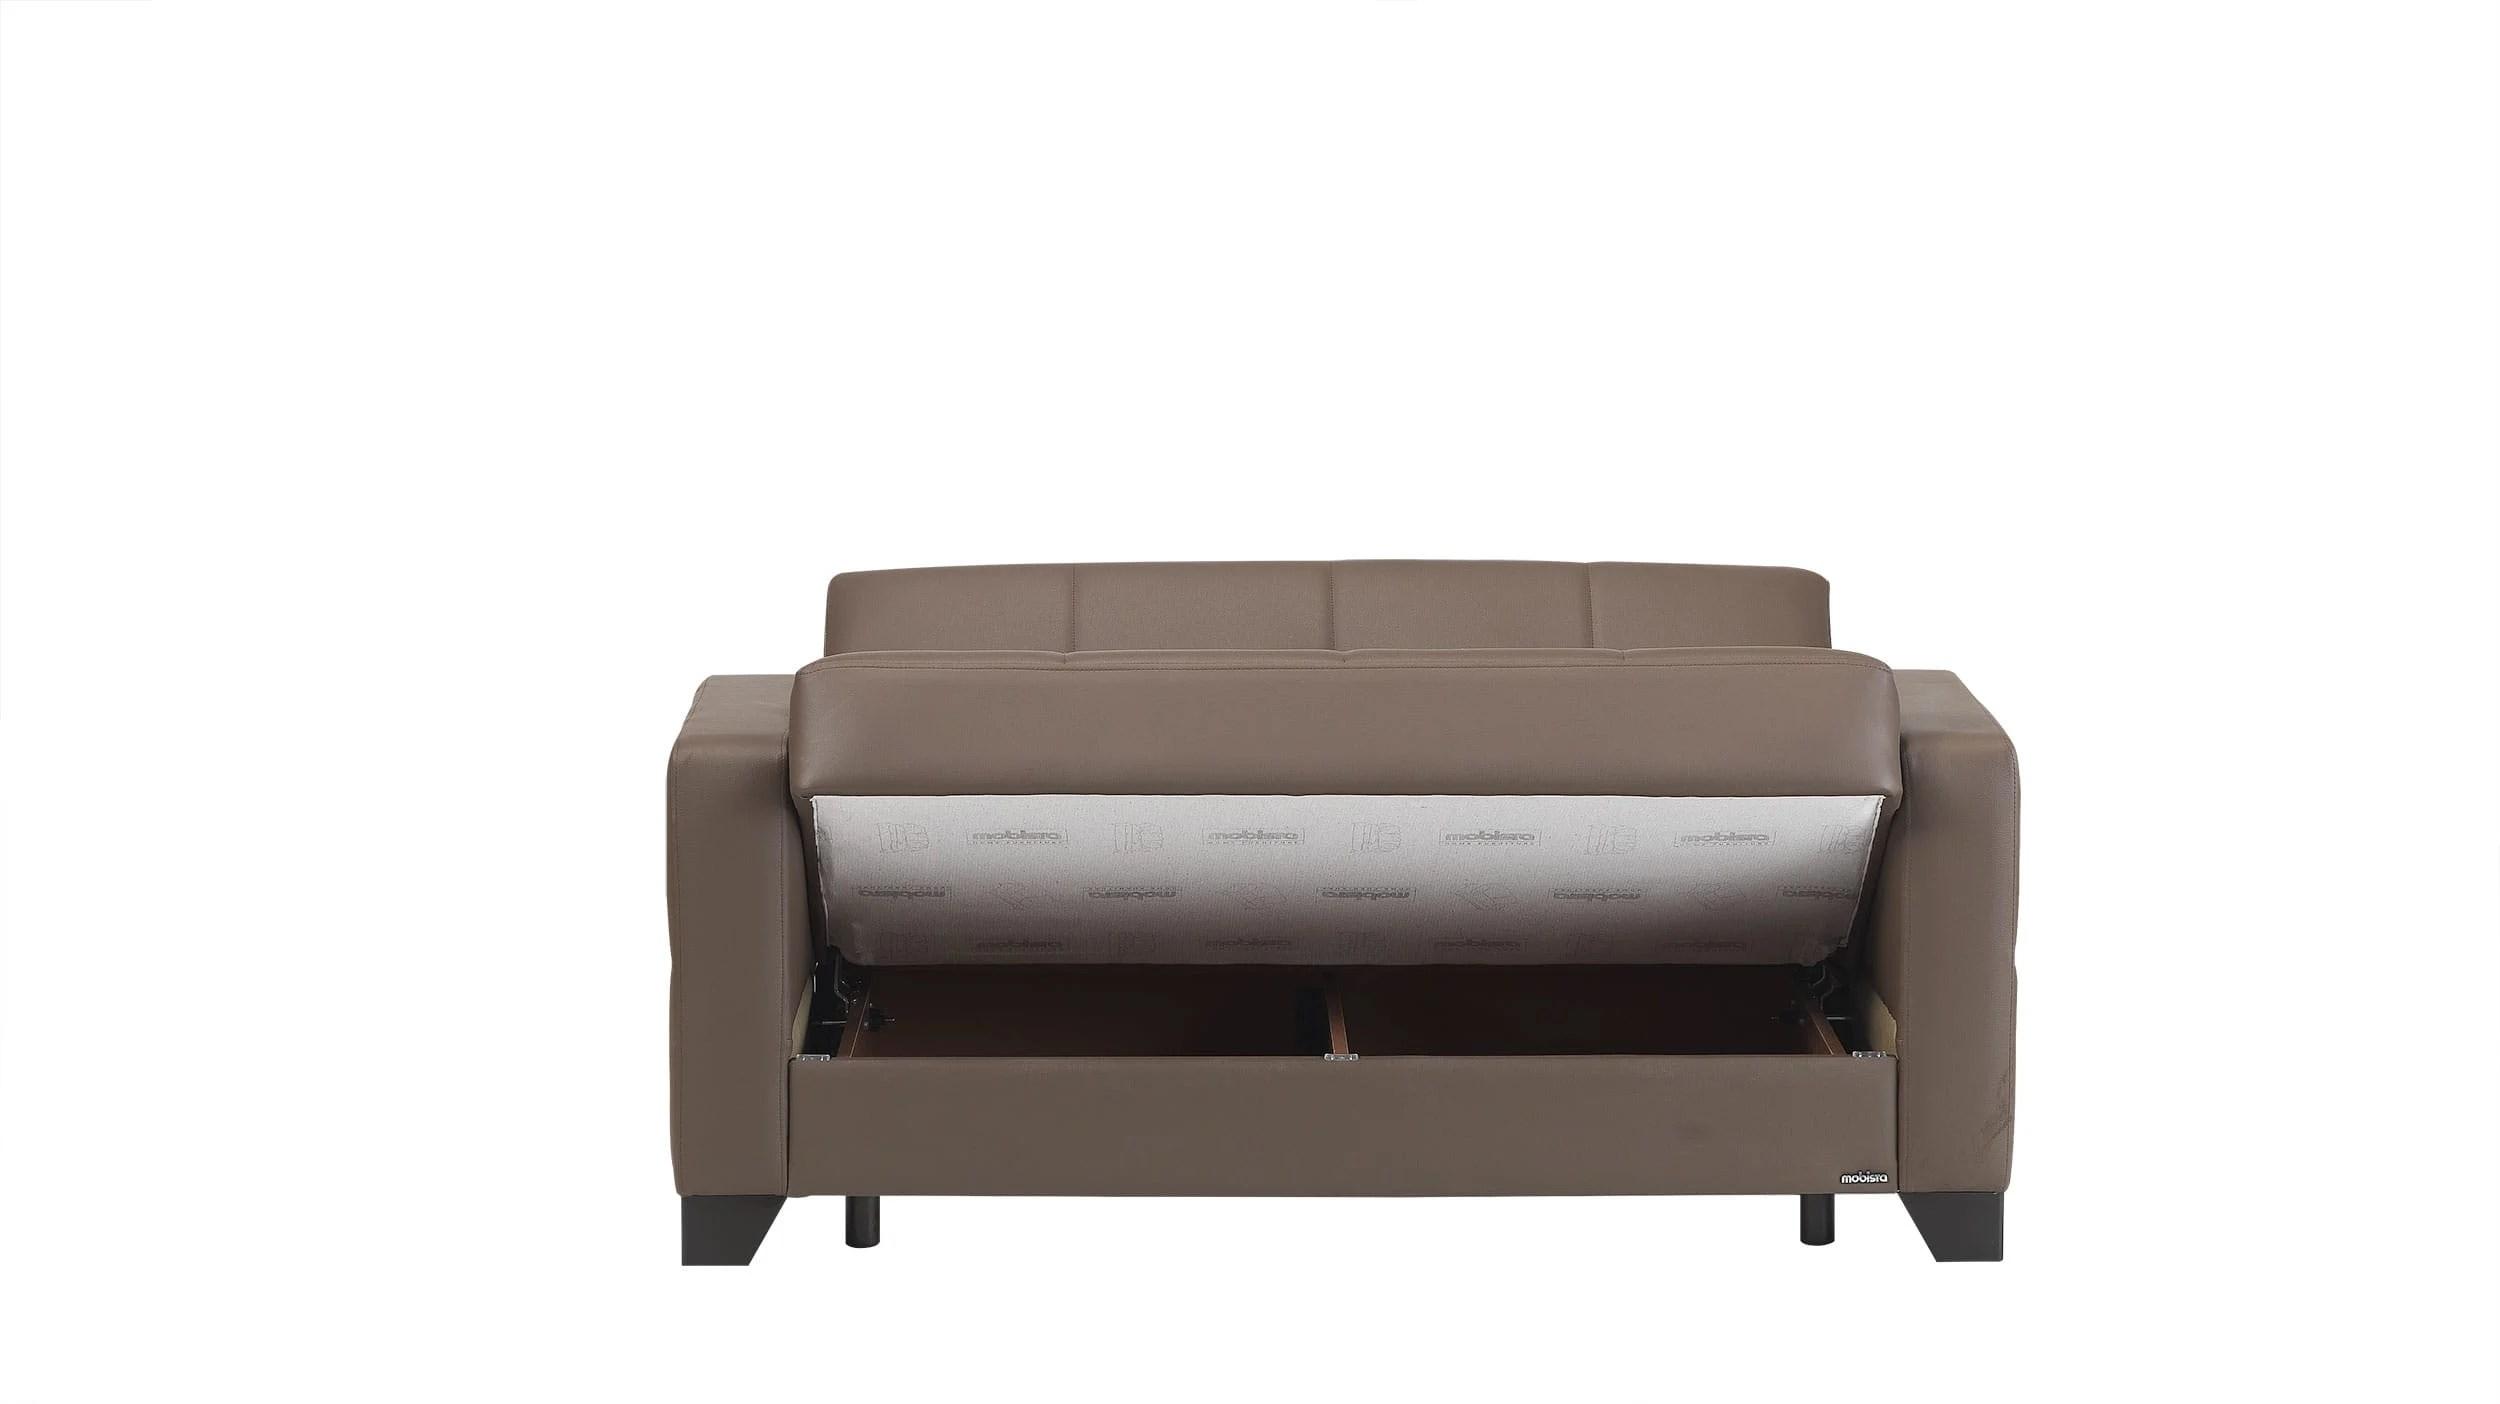 leatherette sofa durability highest rated sleeper viva italia prestige brown loveseat bed by mobista